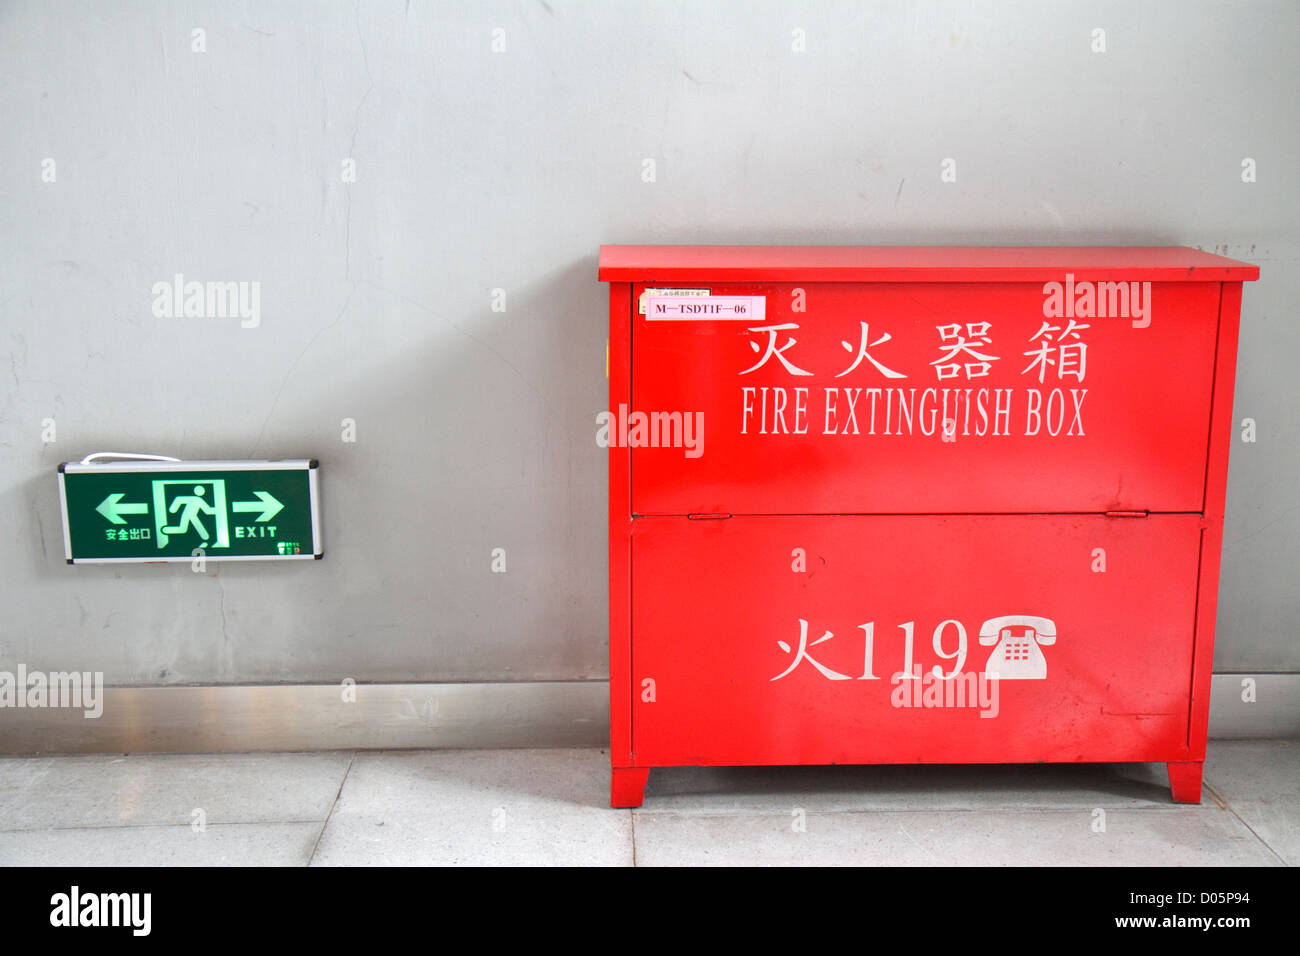 Shanghai China Yangpu District Tongji University Siping Campus fire extinguisher box exit sign Mandarin symbols - Stock Image